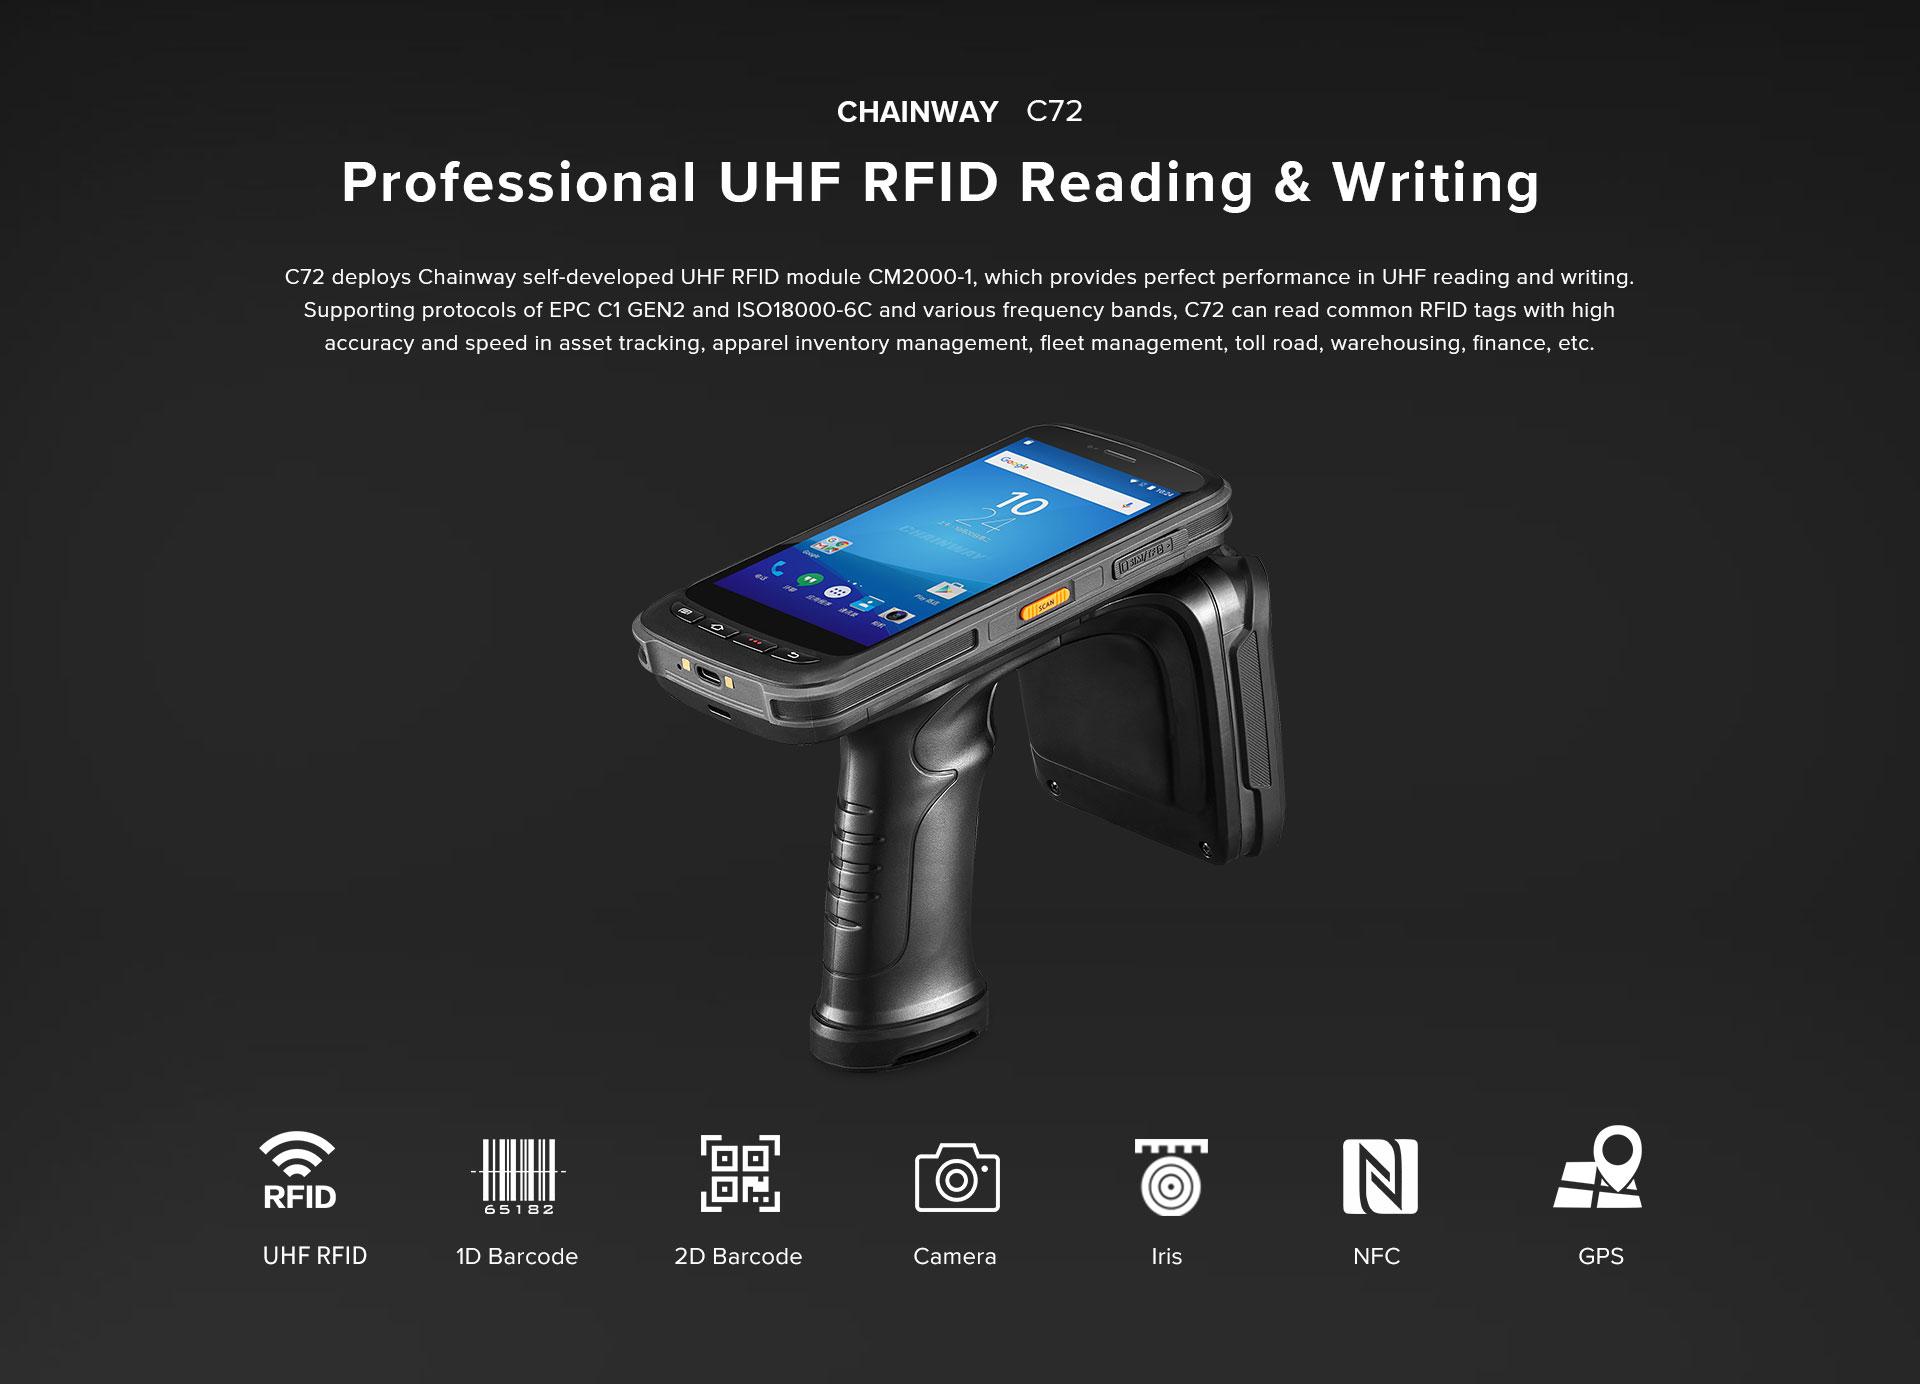 CHAINWAY - Handheld Computer_Handheld RFID Reader_Handheld